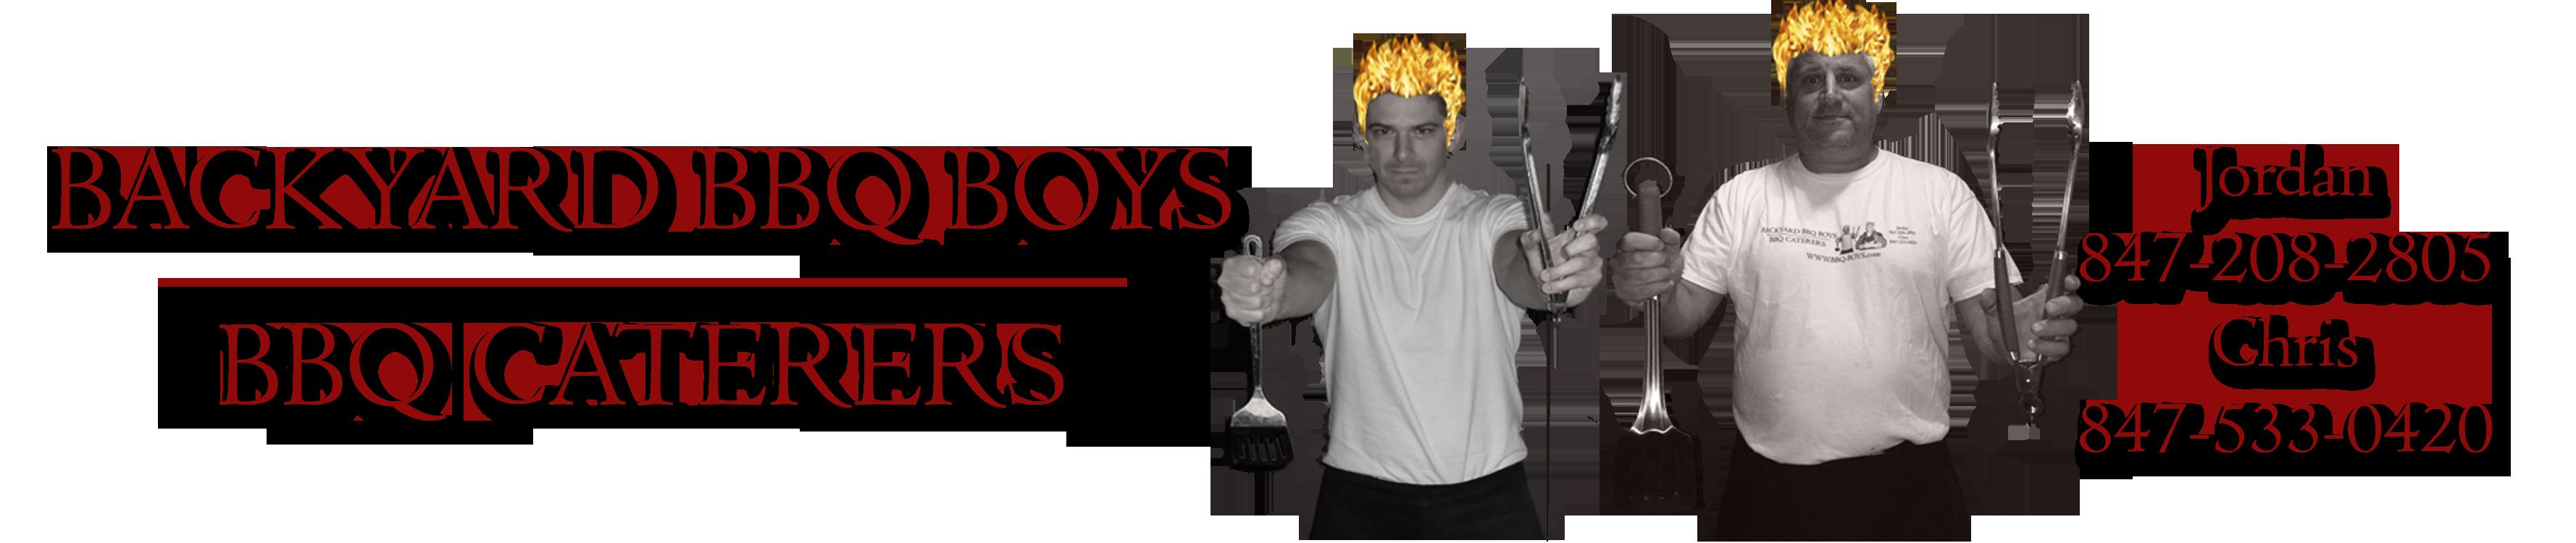 Backyard BBQ Boys Banner